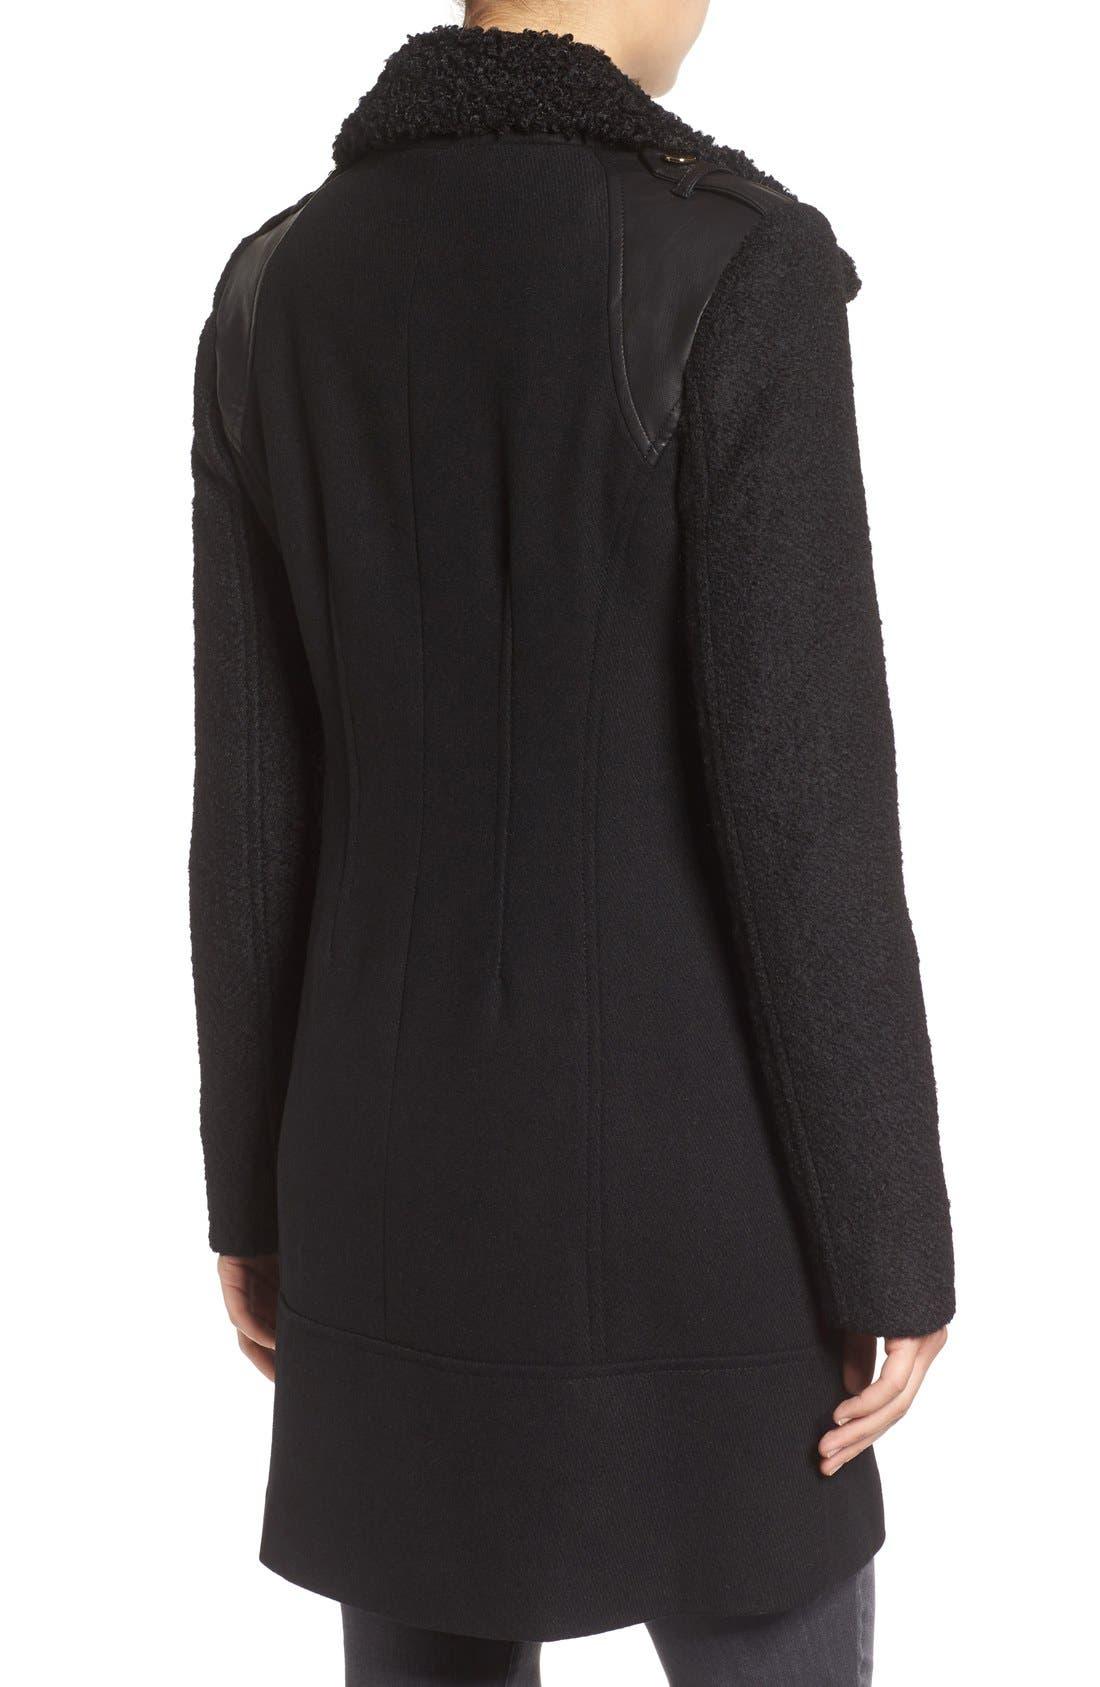 Bouclé Sleeve Wool Blend Military Coat,                             Alternate thumbnail 2, color,                             Black